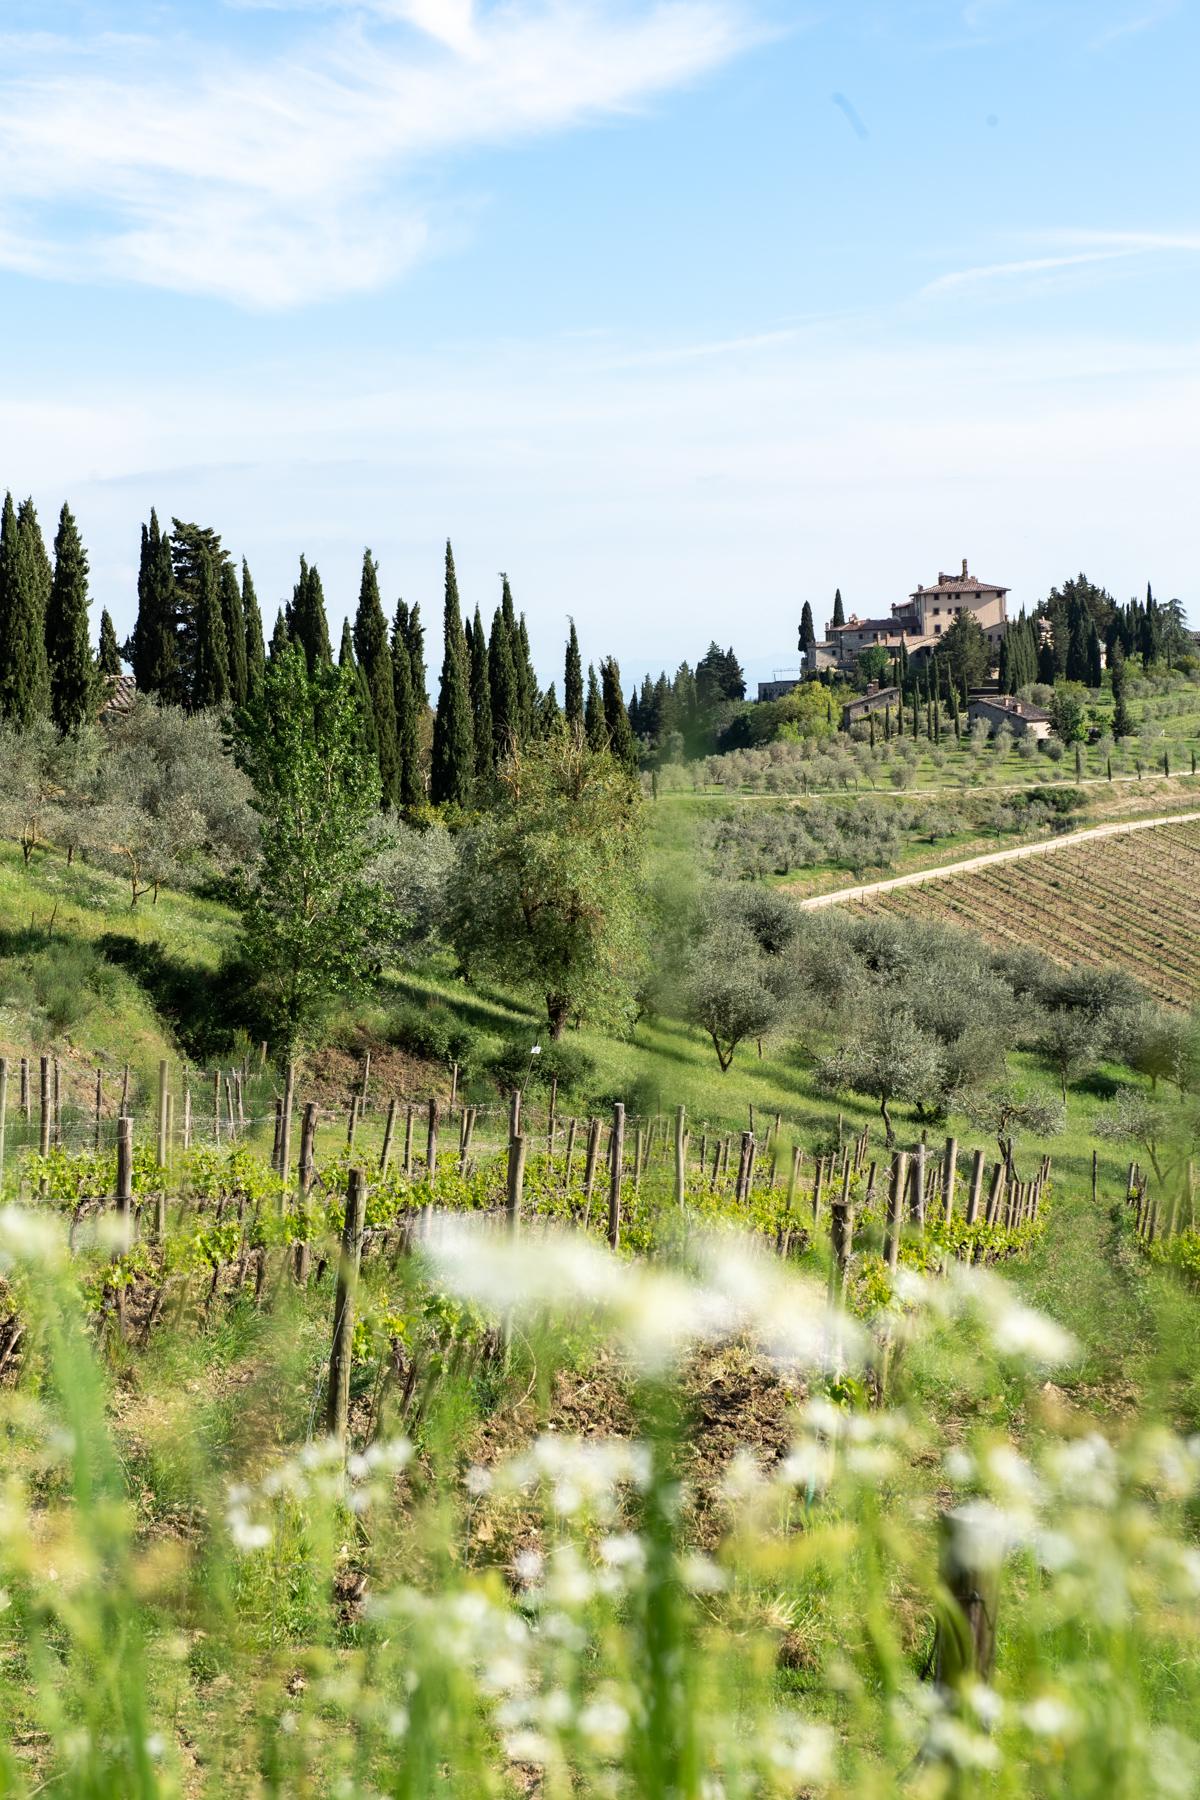 Stacie Flinner x Cuvee Tuscan Farmhouse Tuscany Italy Guide-117.jpg